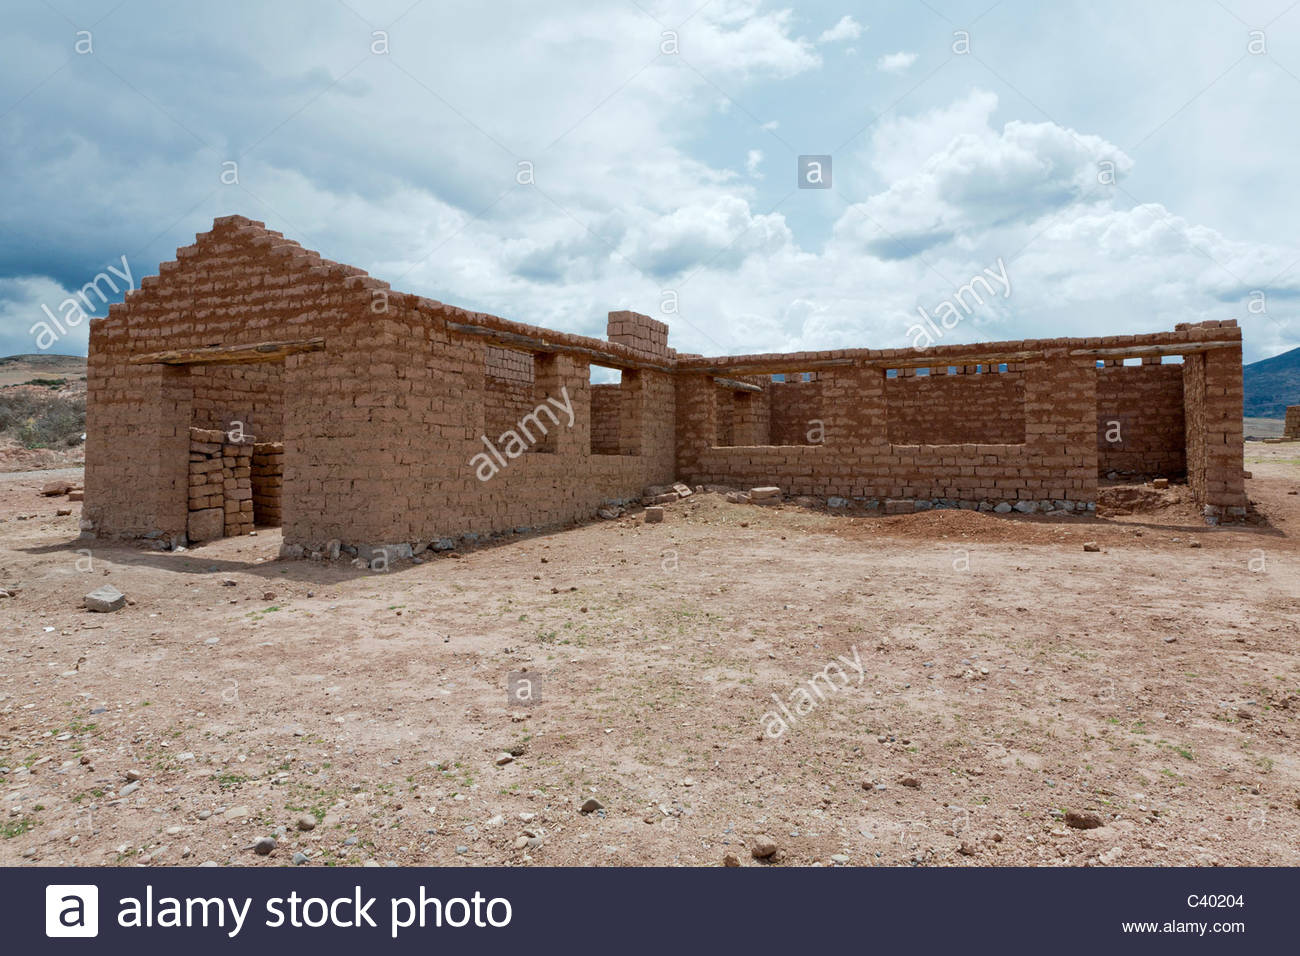 An Adobe House Being Built Using Hand Made Adobe Bricks